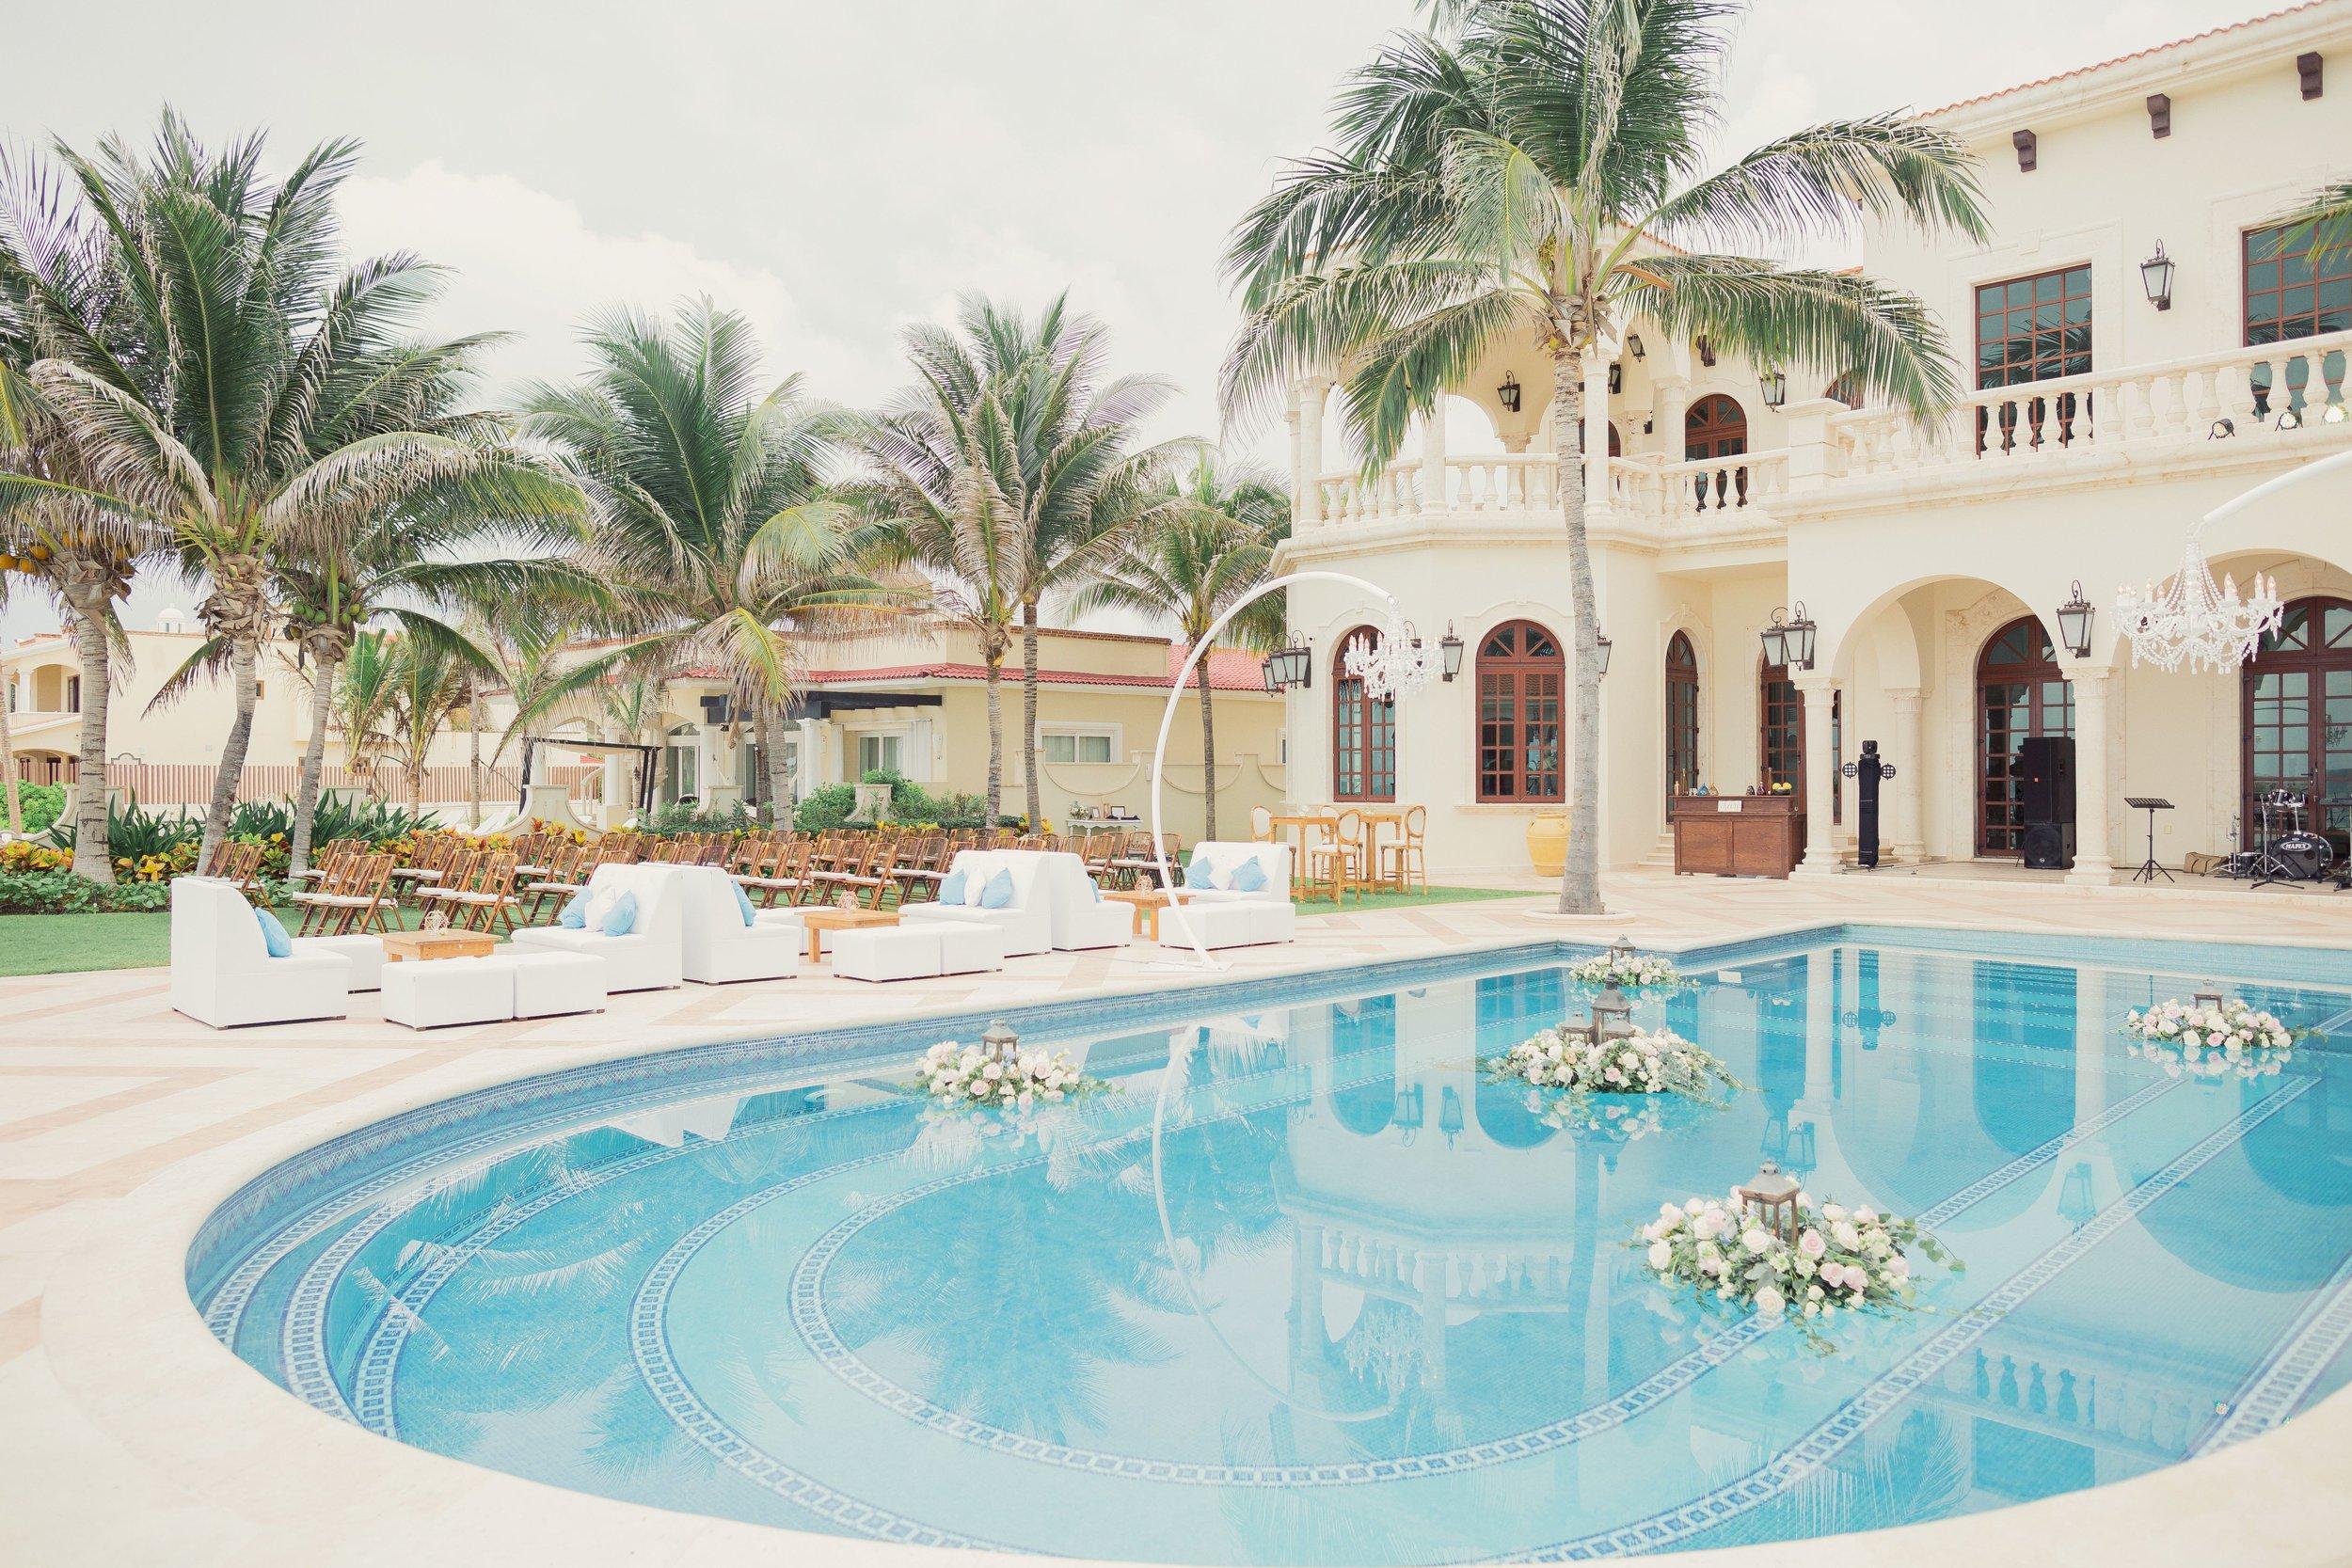 cancun-wedding-venue-villa-la-joya-84 copy-websize.jpg